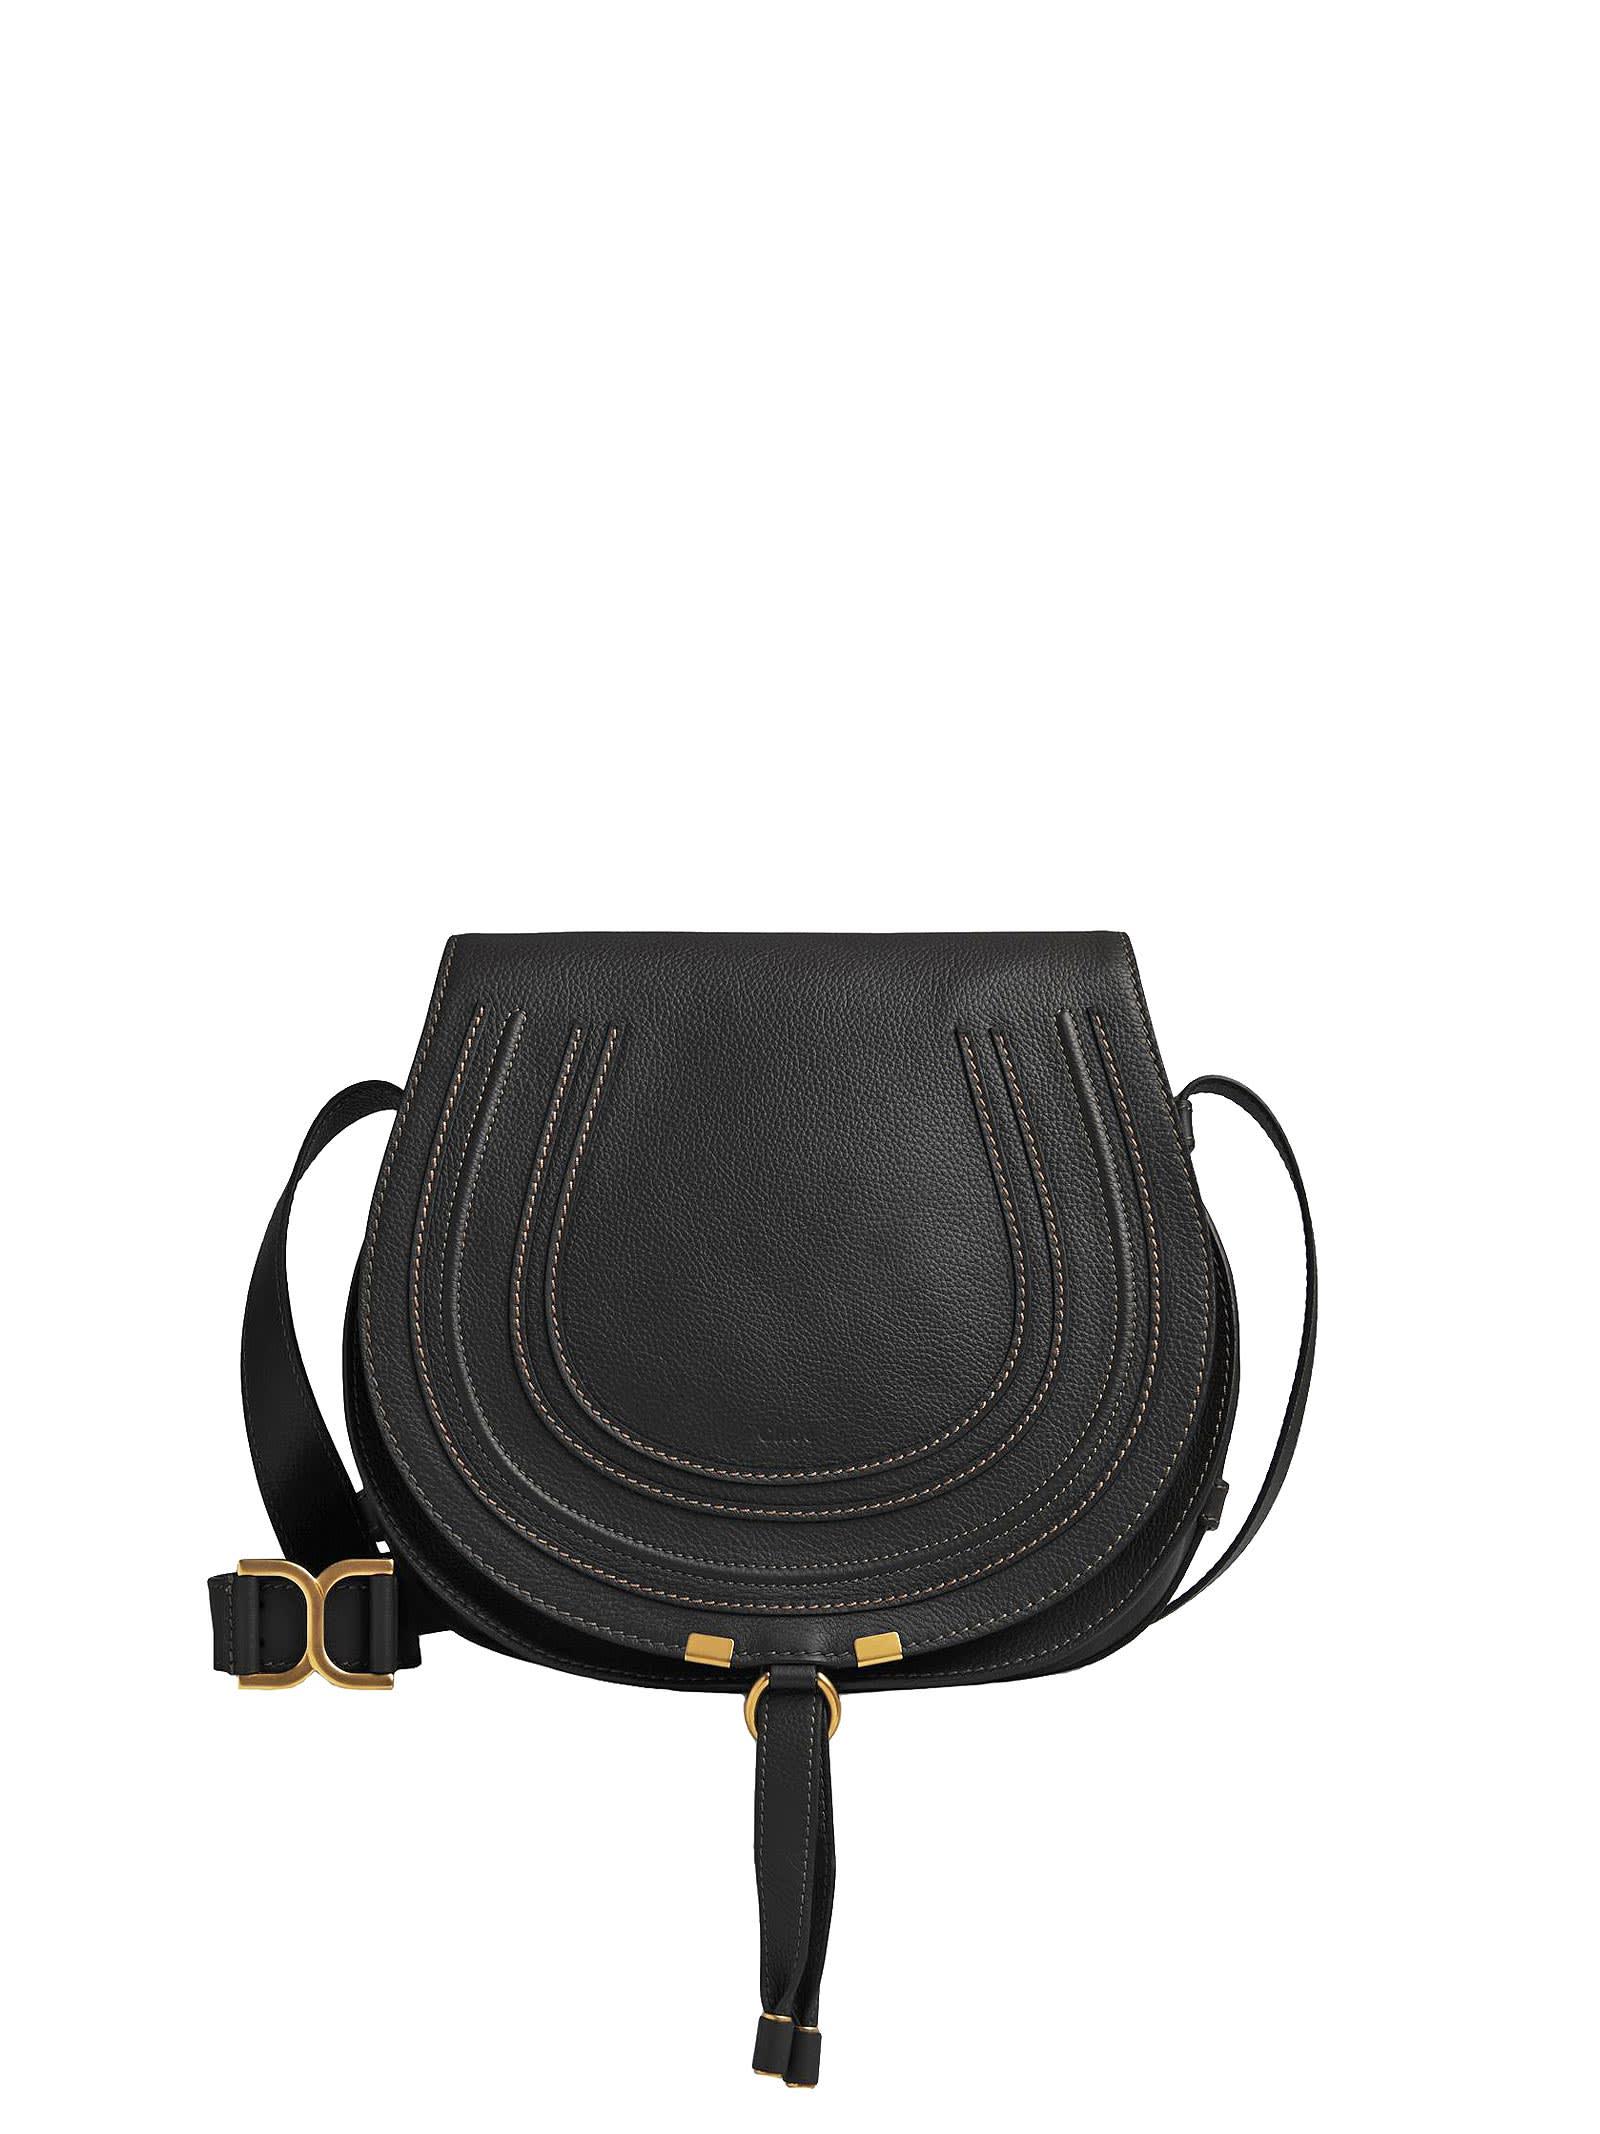 Chloé Marcie Medium Shoulder Bag In Black